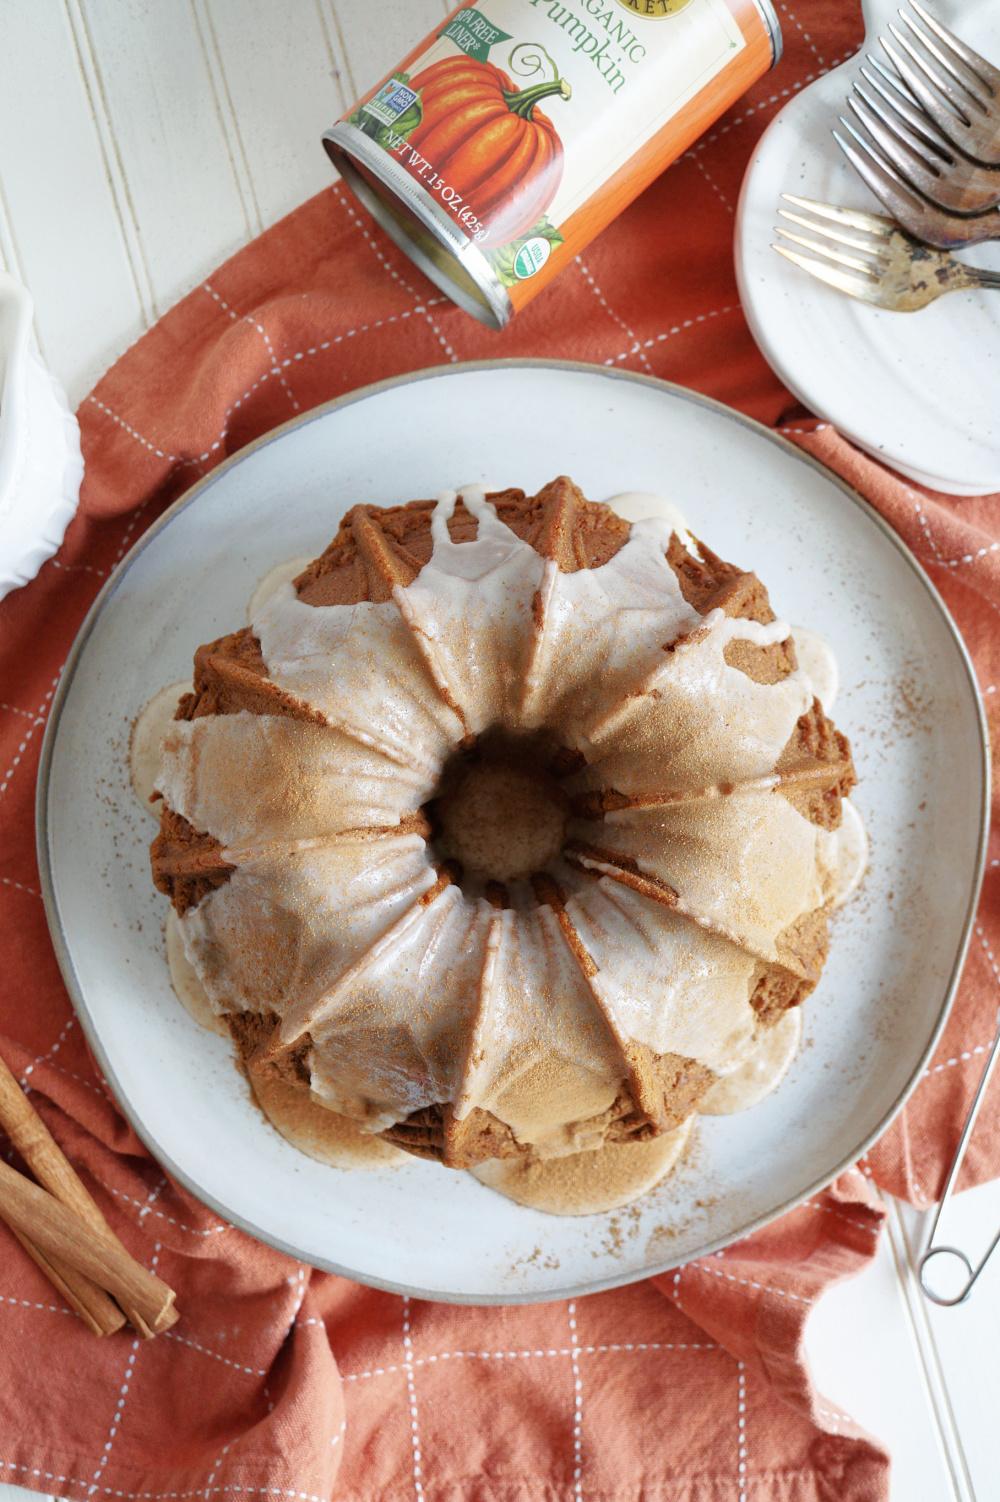 overhead shot of bundt cake on plate